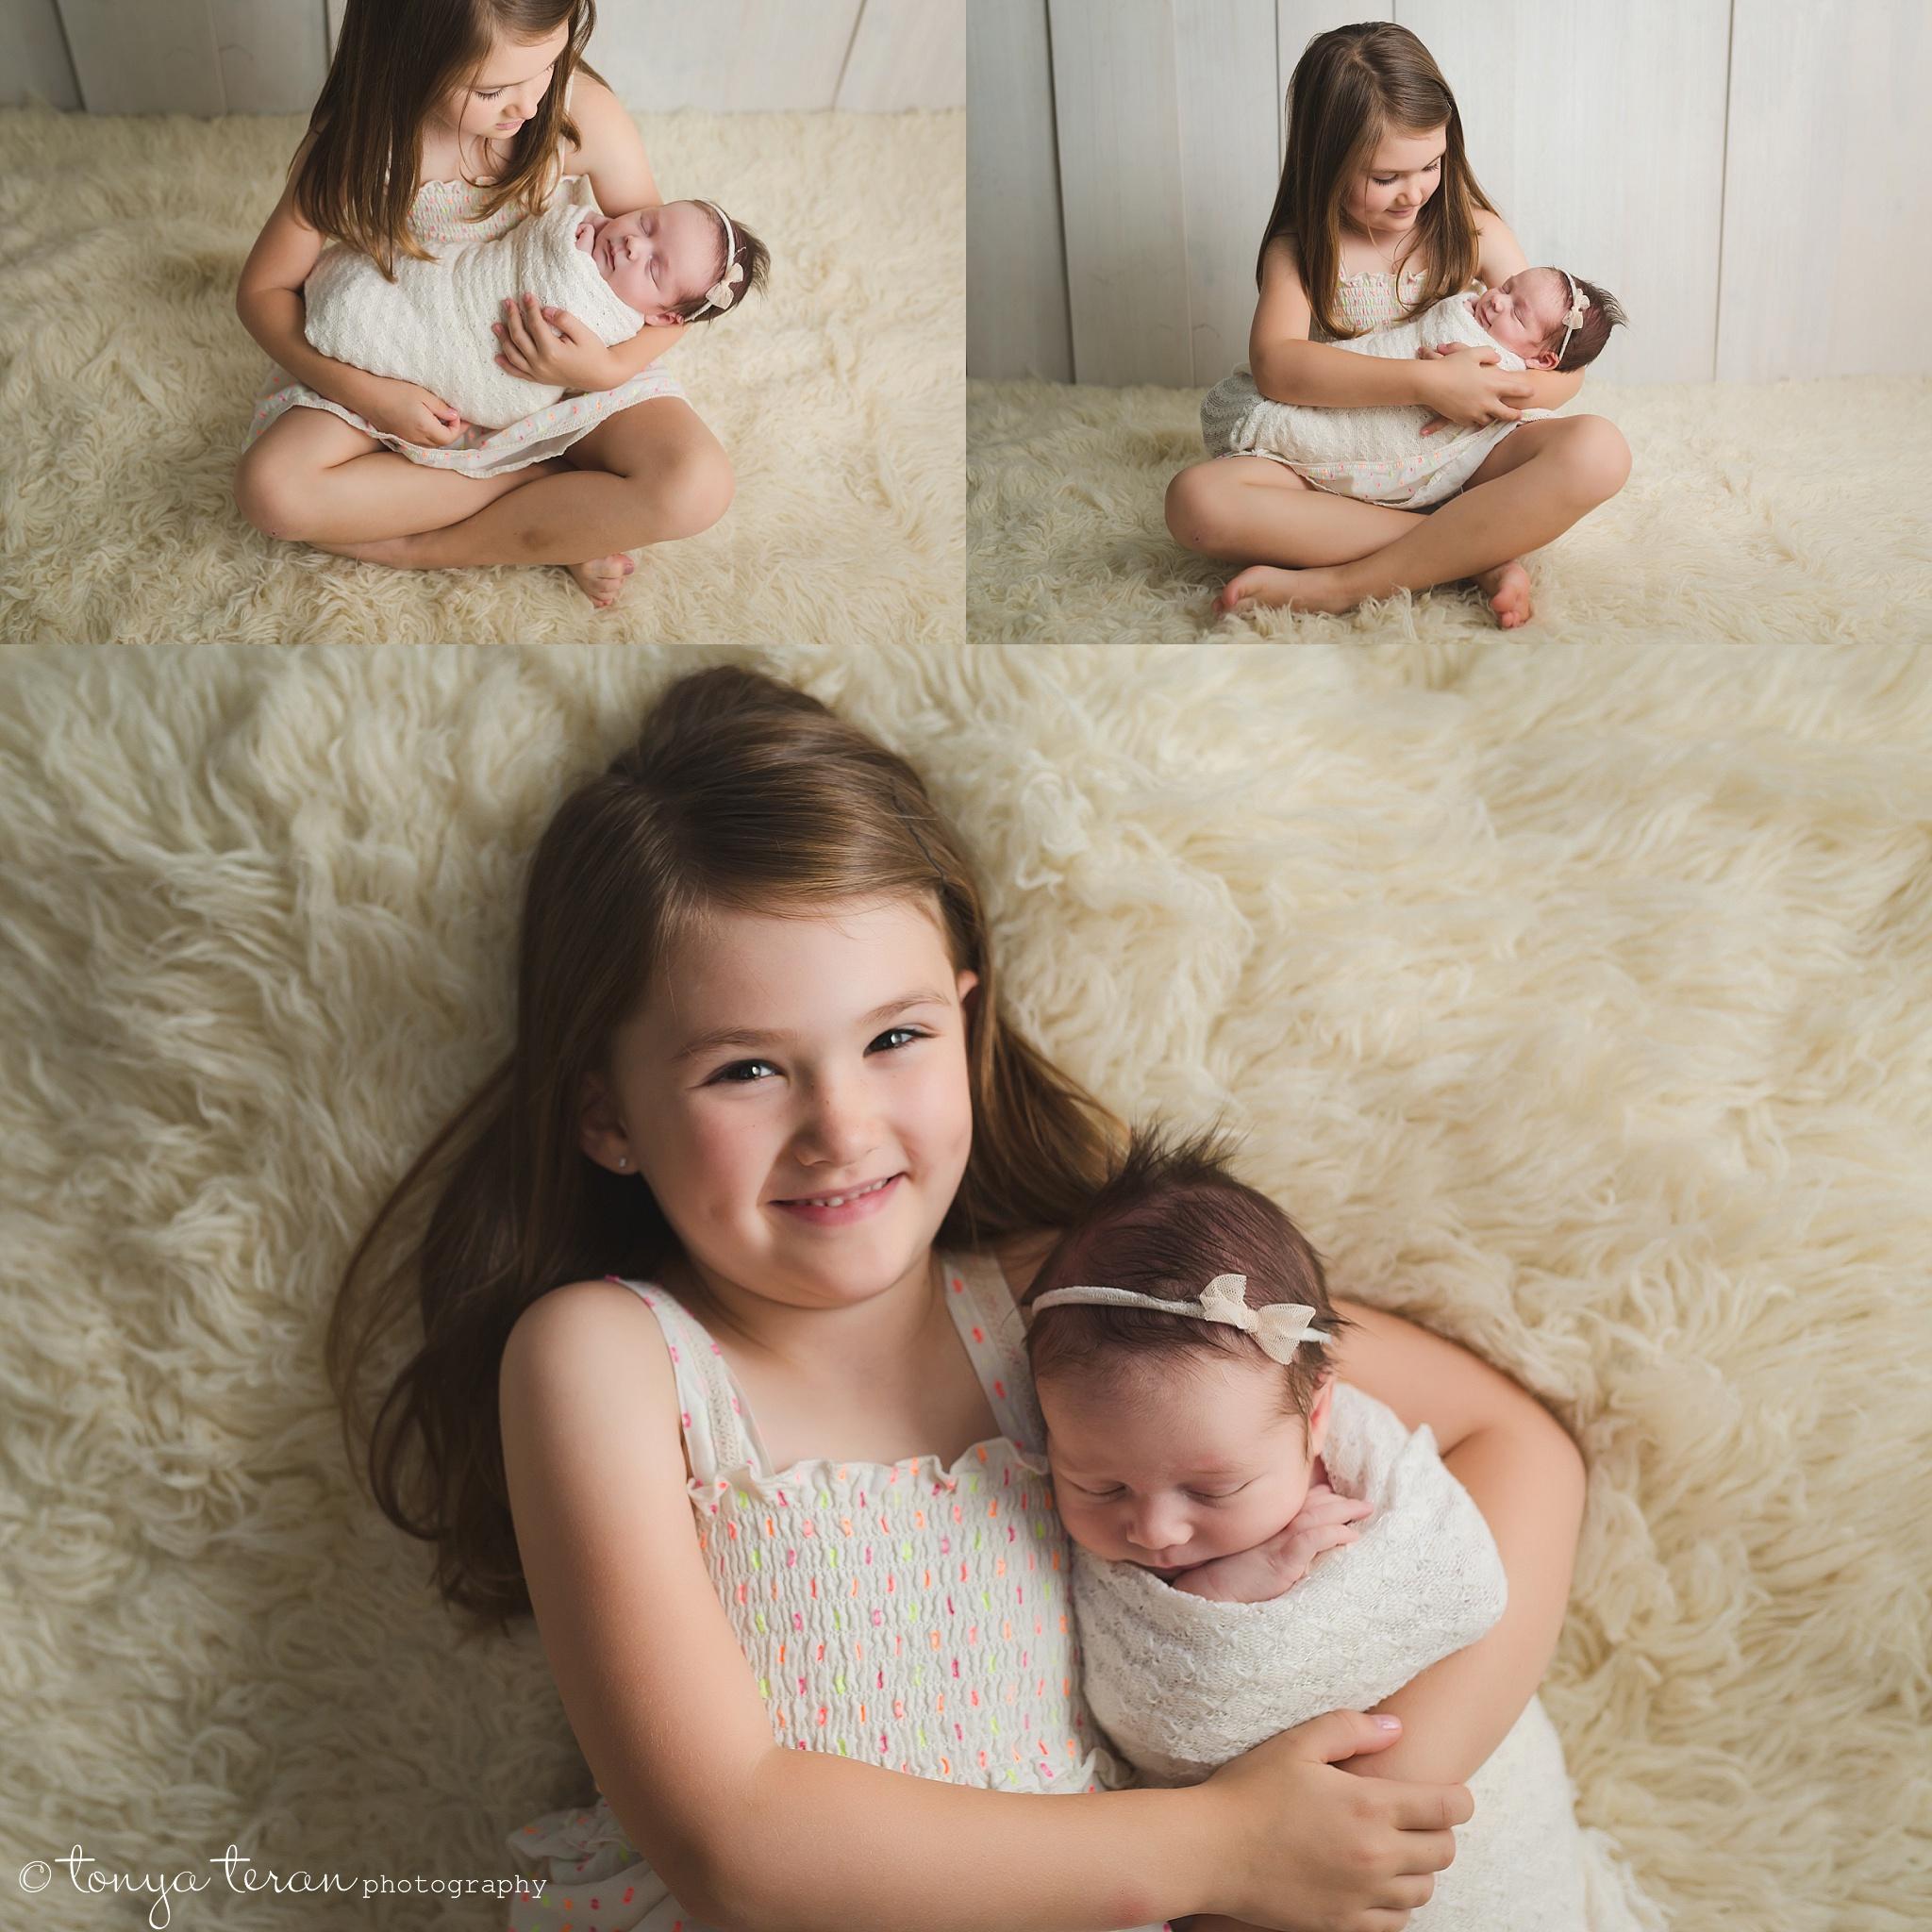 Mini Maternity Photo Session | Tonya Teran Photography, Bethesda, MD Newborn, Baby, and Family Photographer